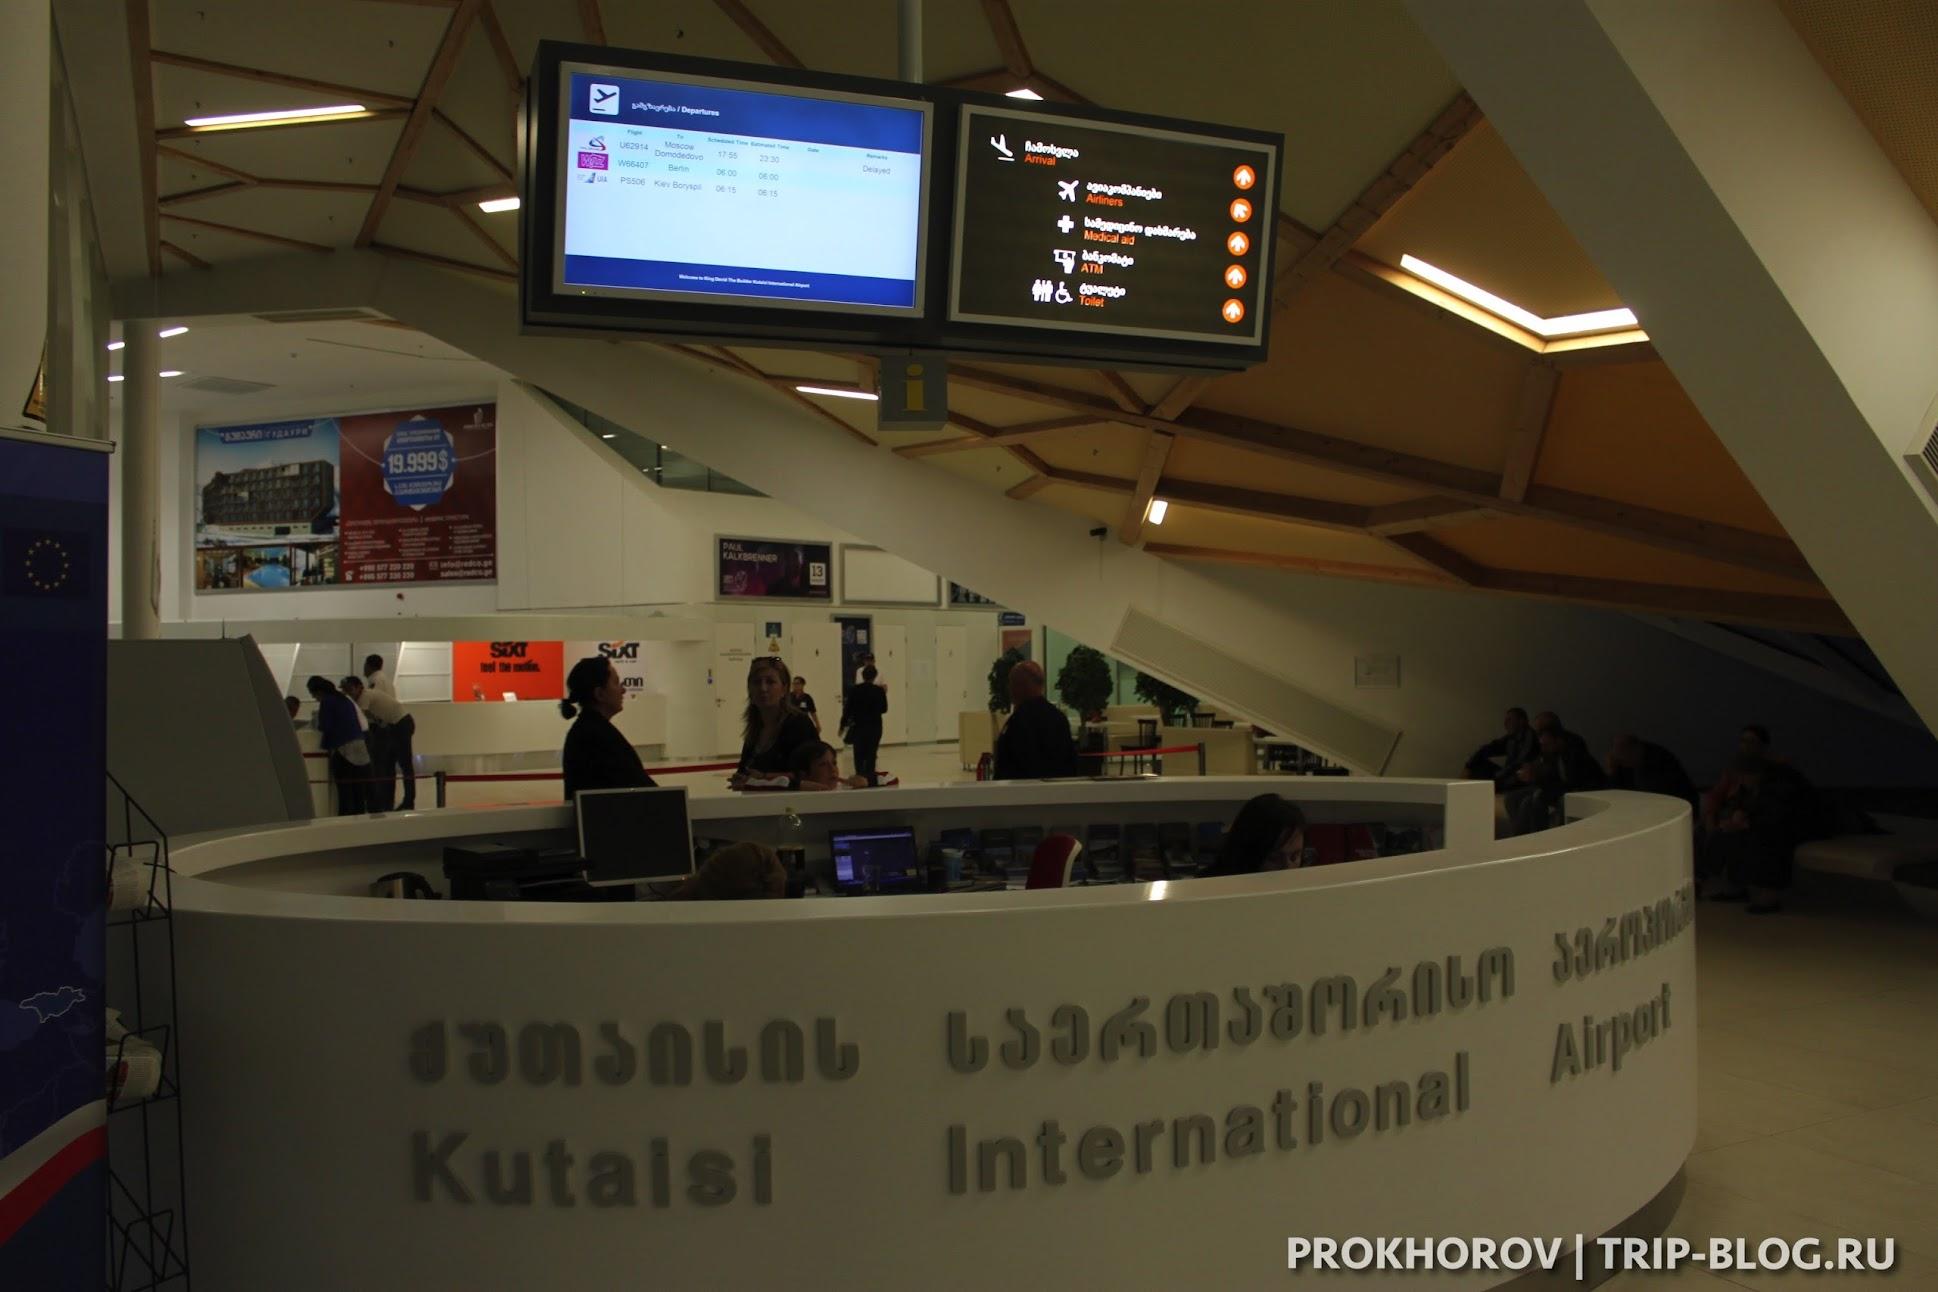 аэропорт кутаиси онлайн табло